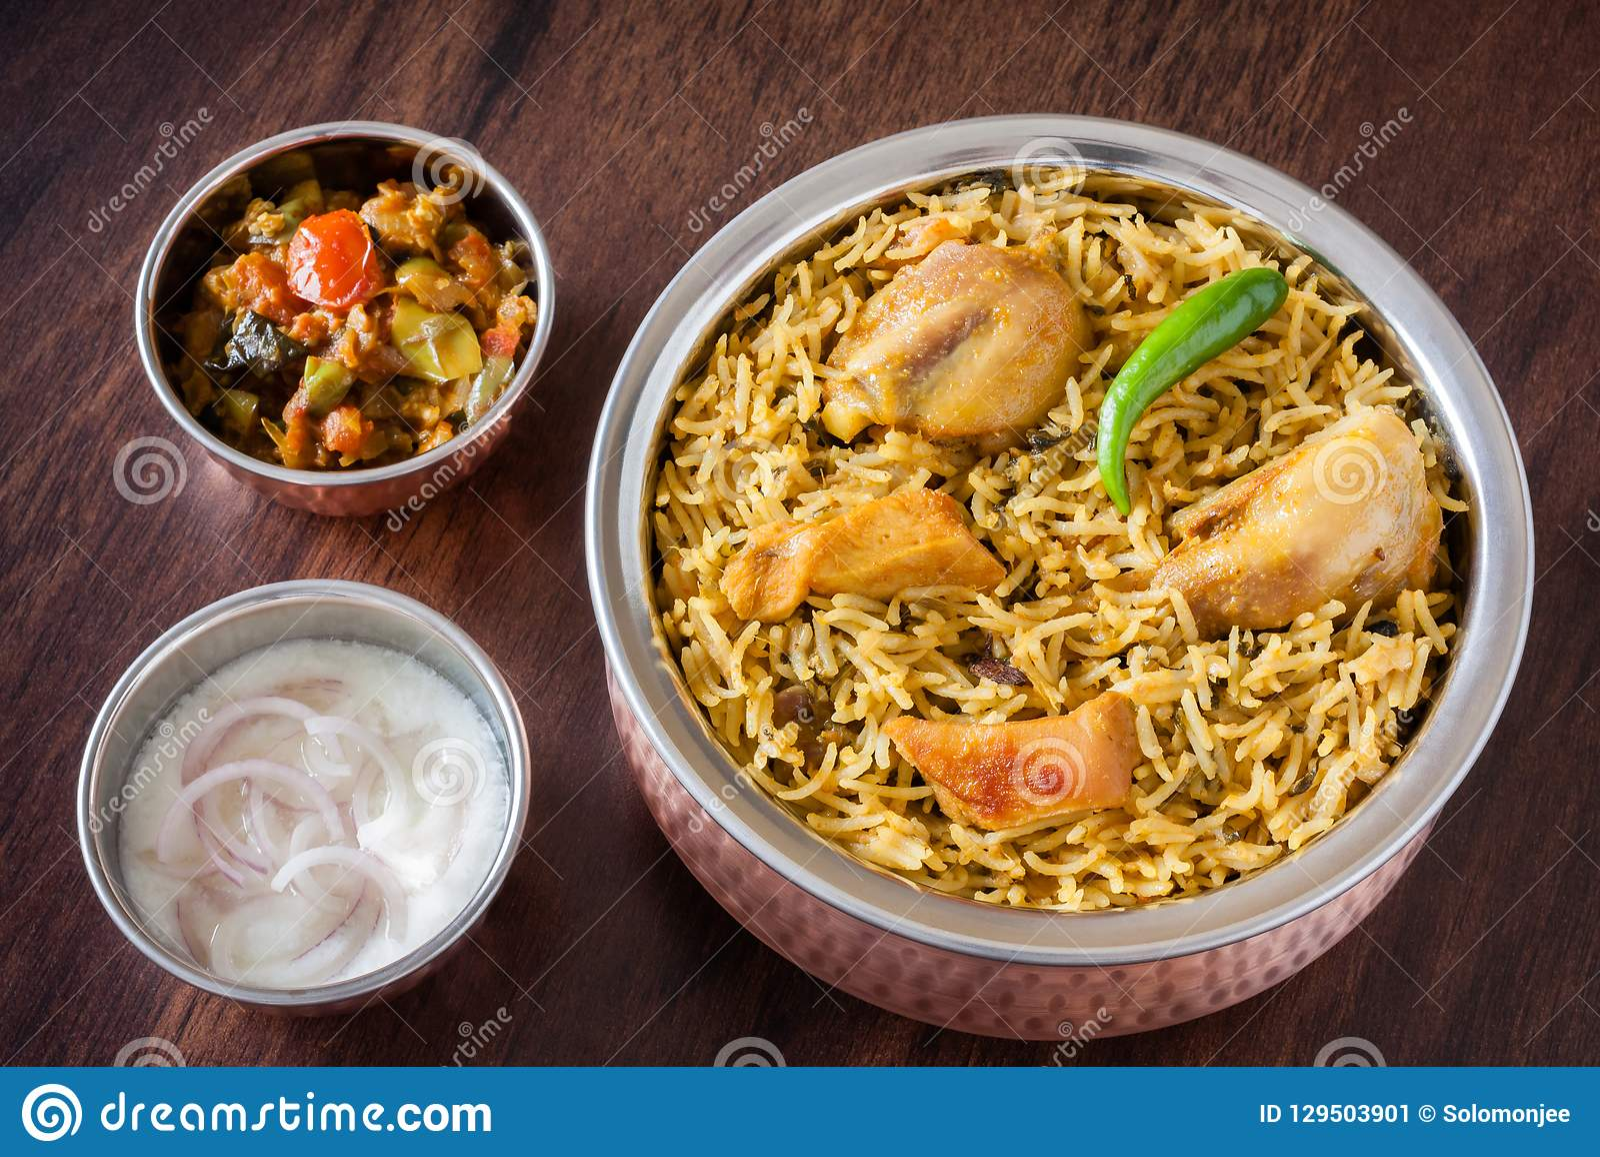 Huhn Biryani mit Salat